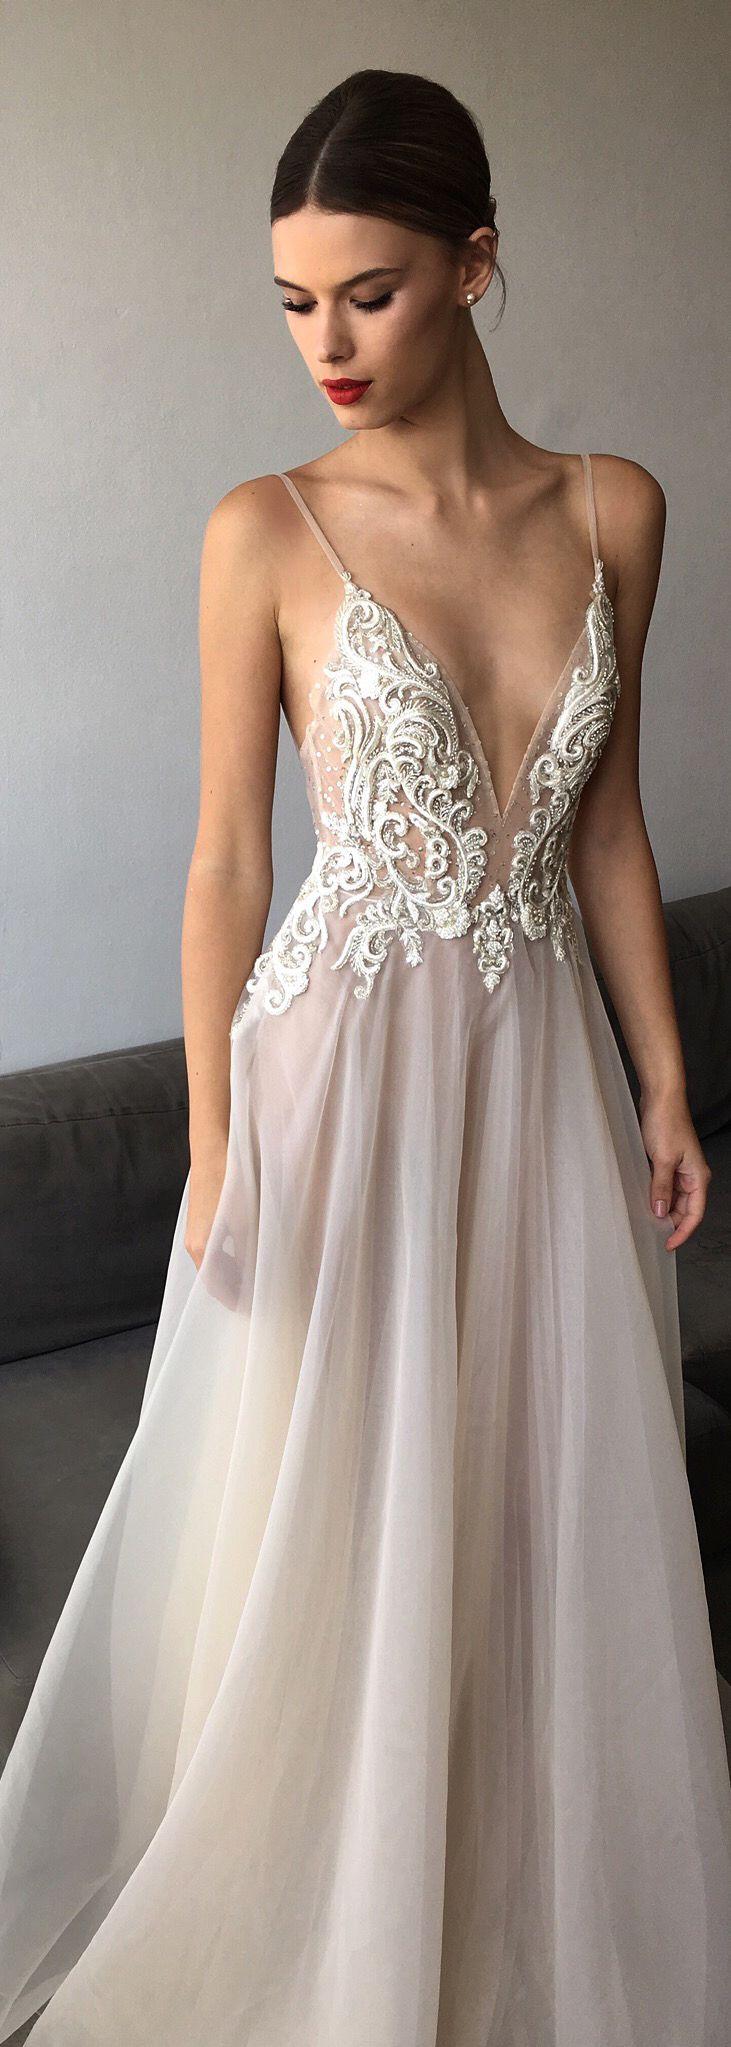 Wedding Dress - Muse by Berta Bridal |@bertabridal